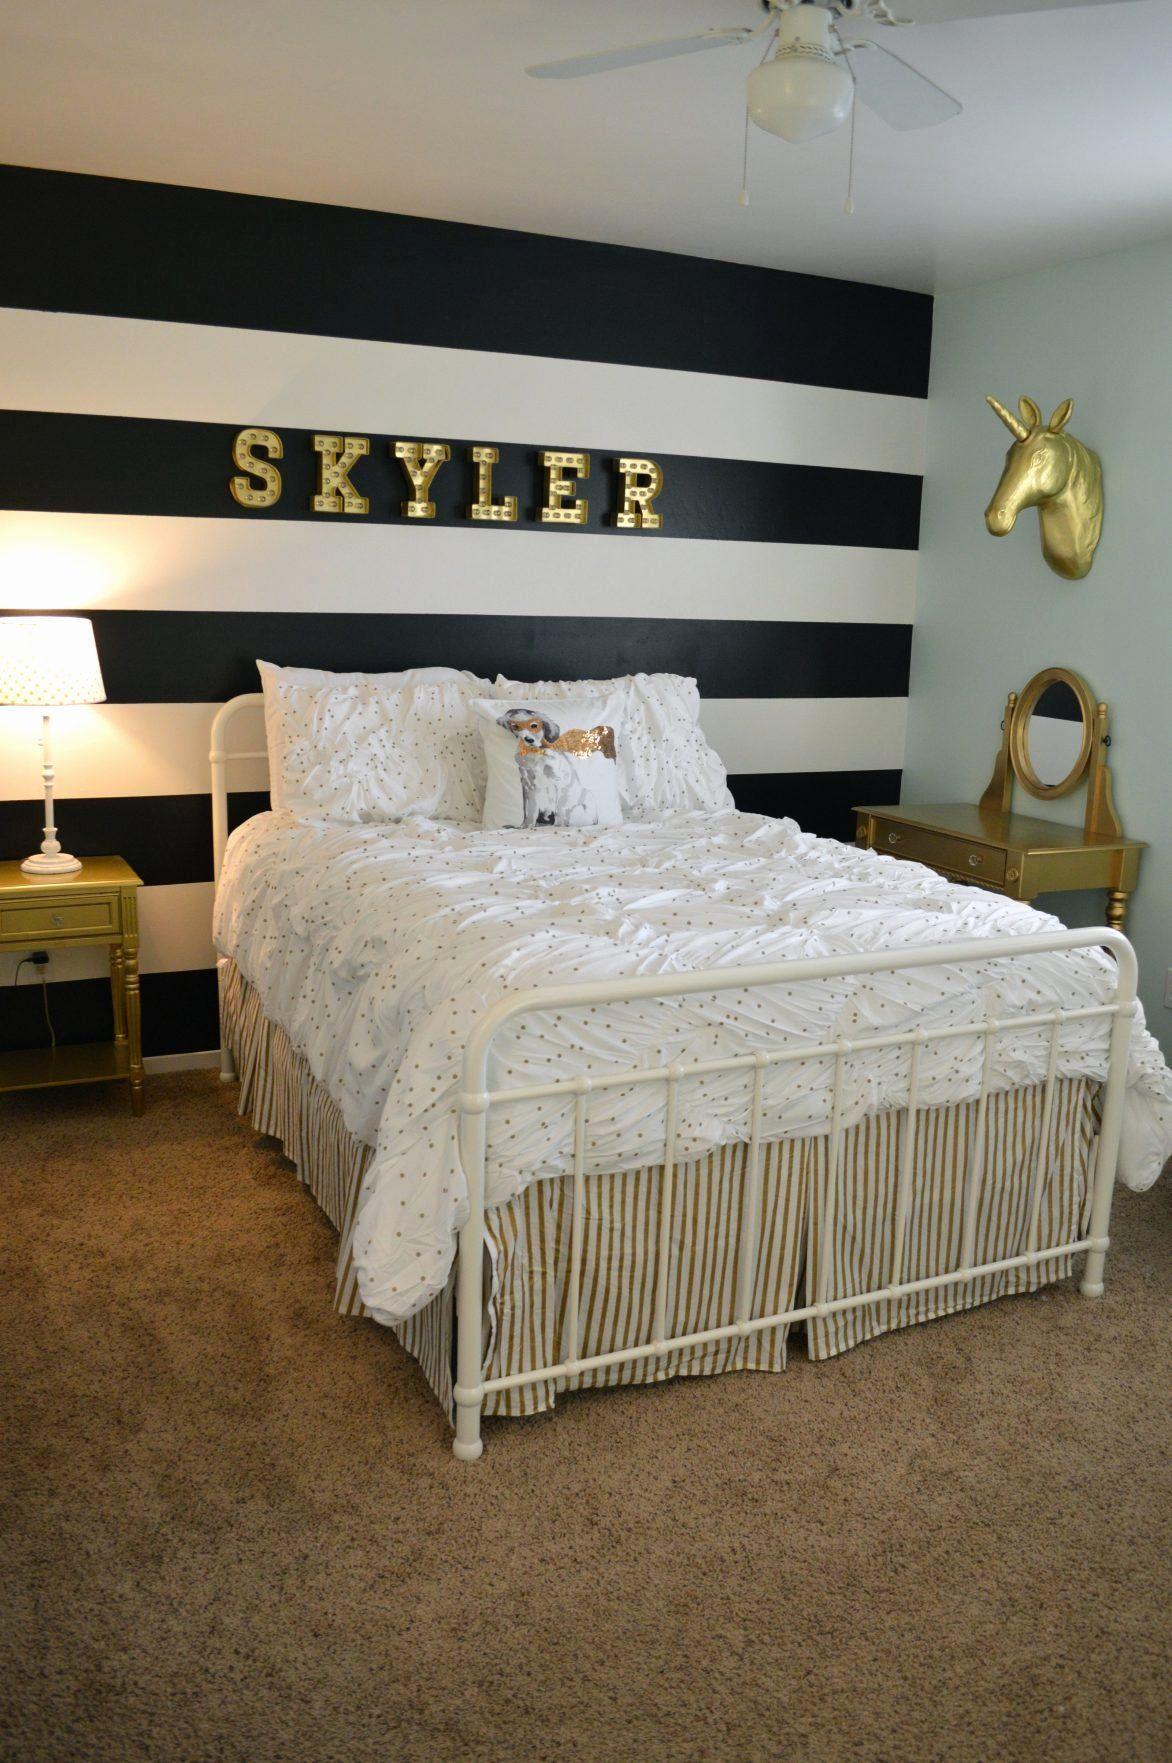 Dark Grey Bedroom Ideas Luxury Purple And Grey Bedroom Ideas Furniture Decor Decorating Gold Bedroom Decor Gold Room Decor Gold Bedroom